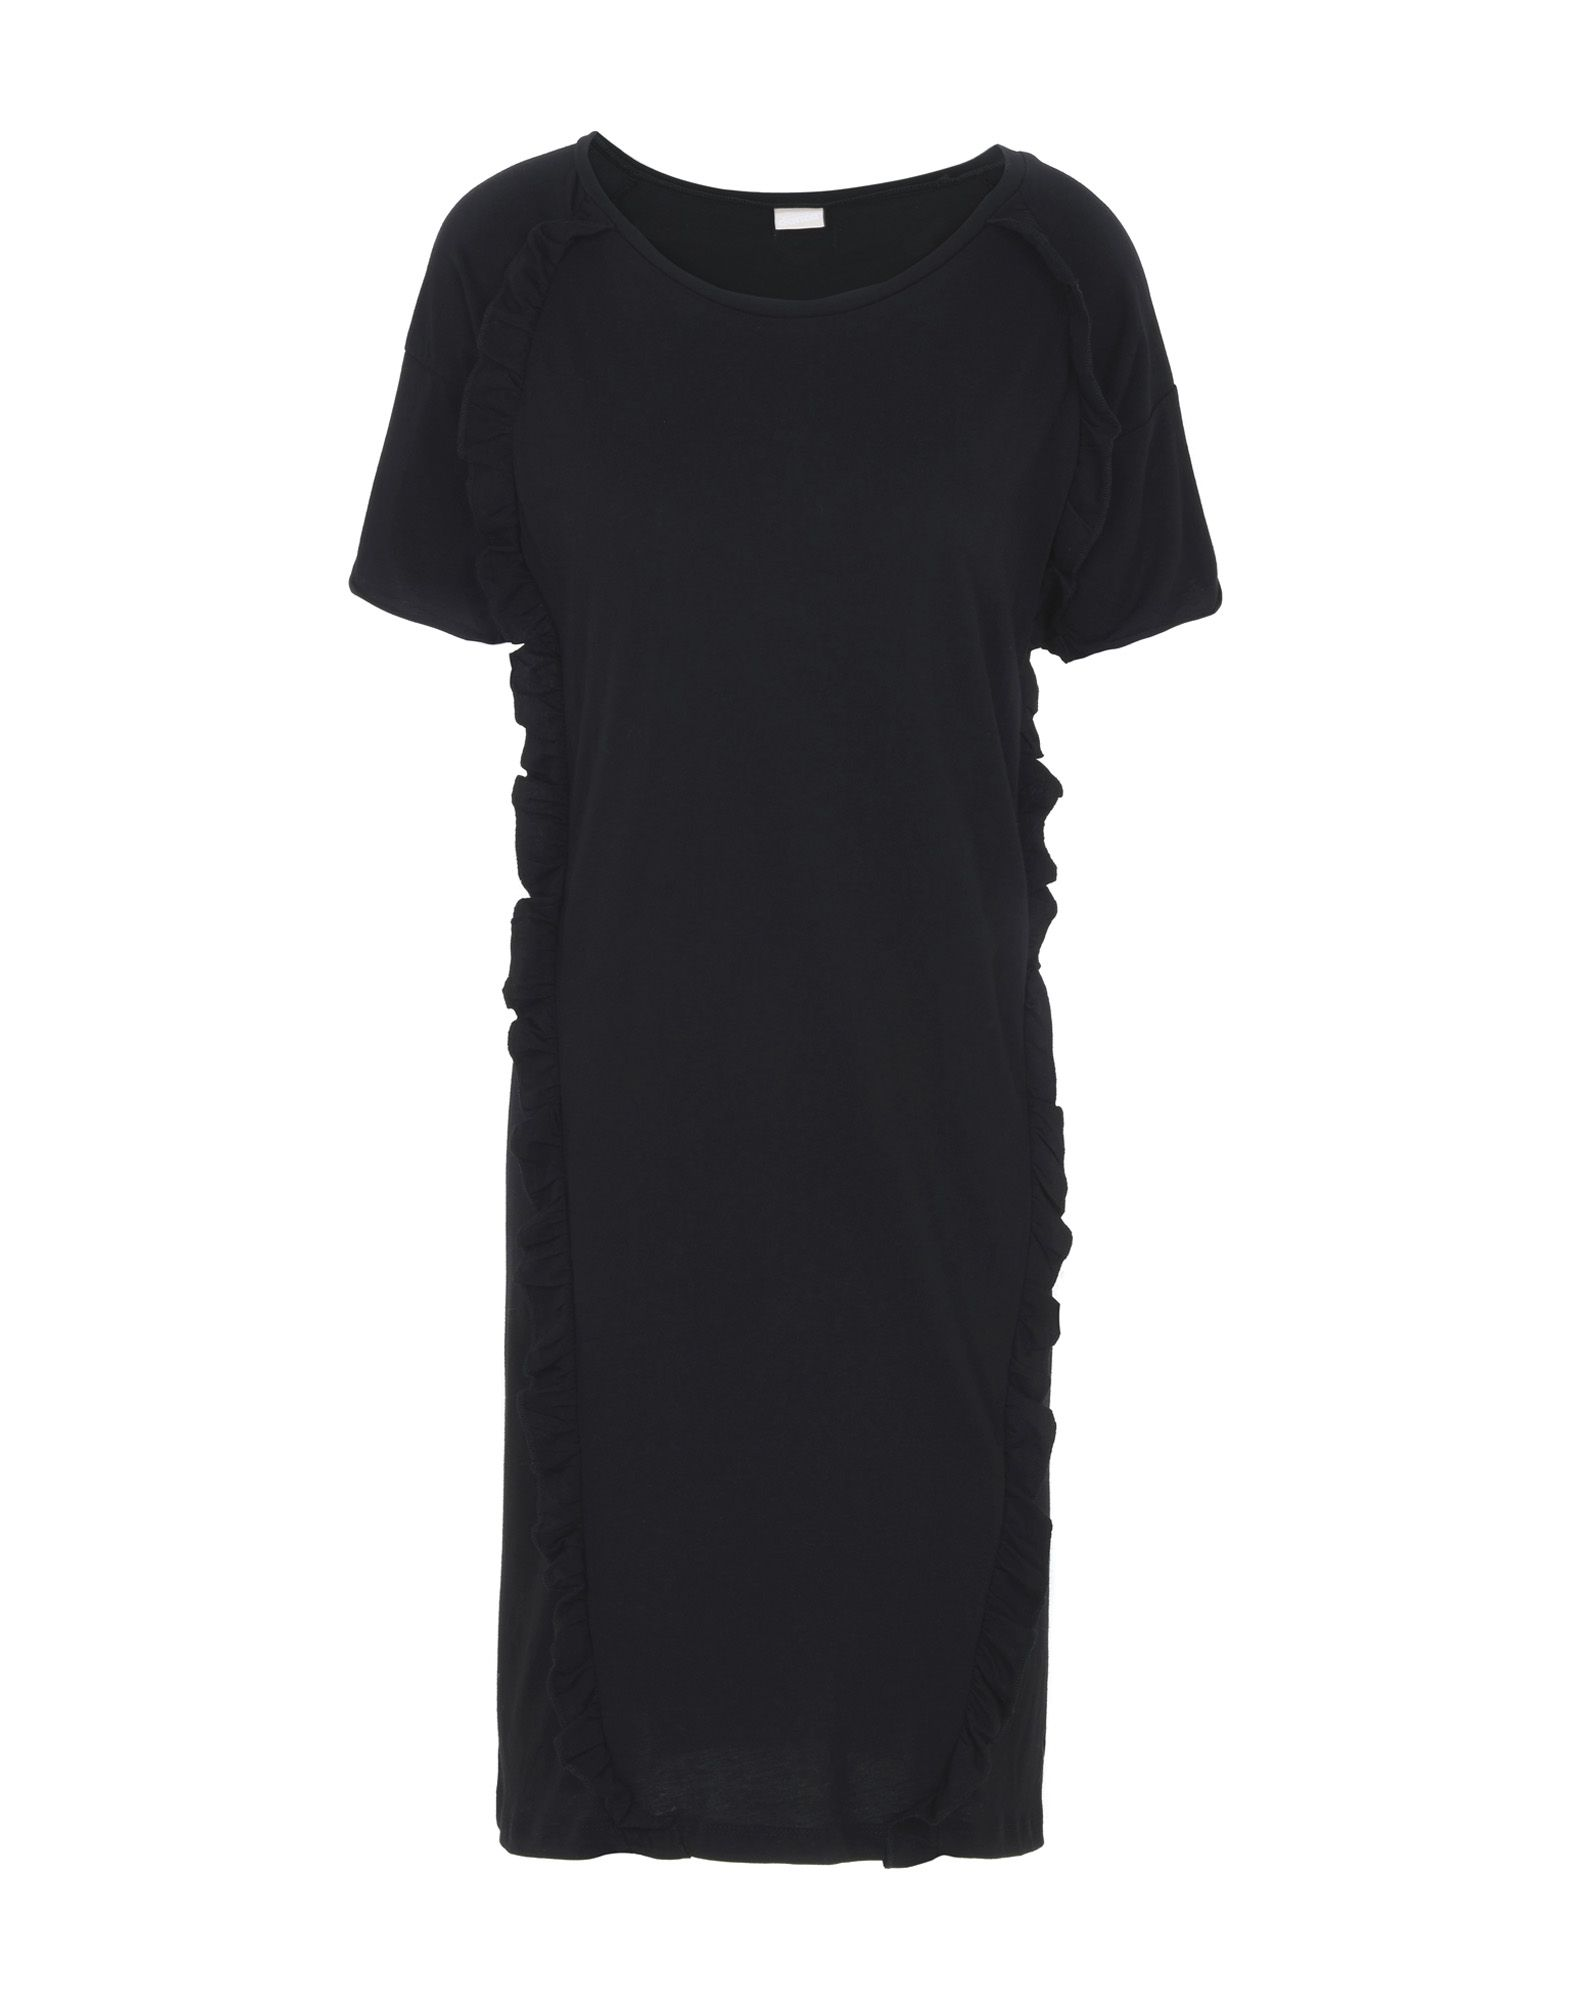 цены на DIMENSIONE DANZA Короткое платье  в интернет-магазинах